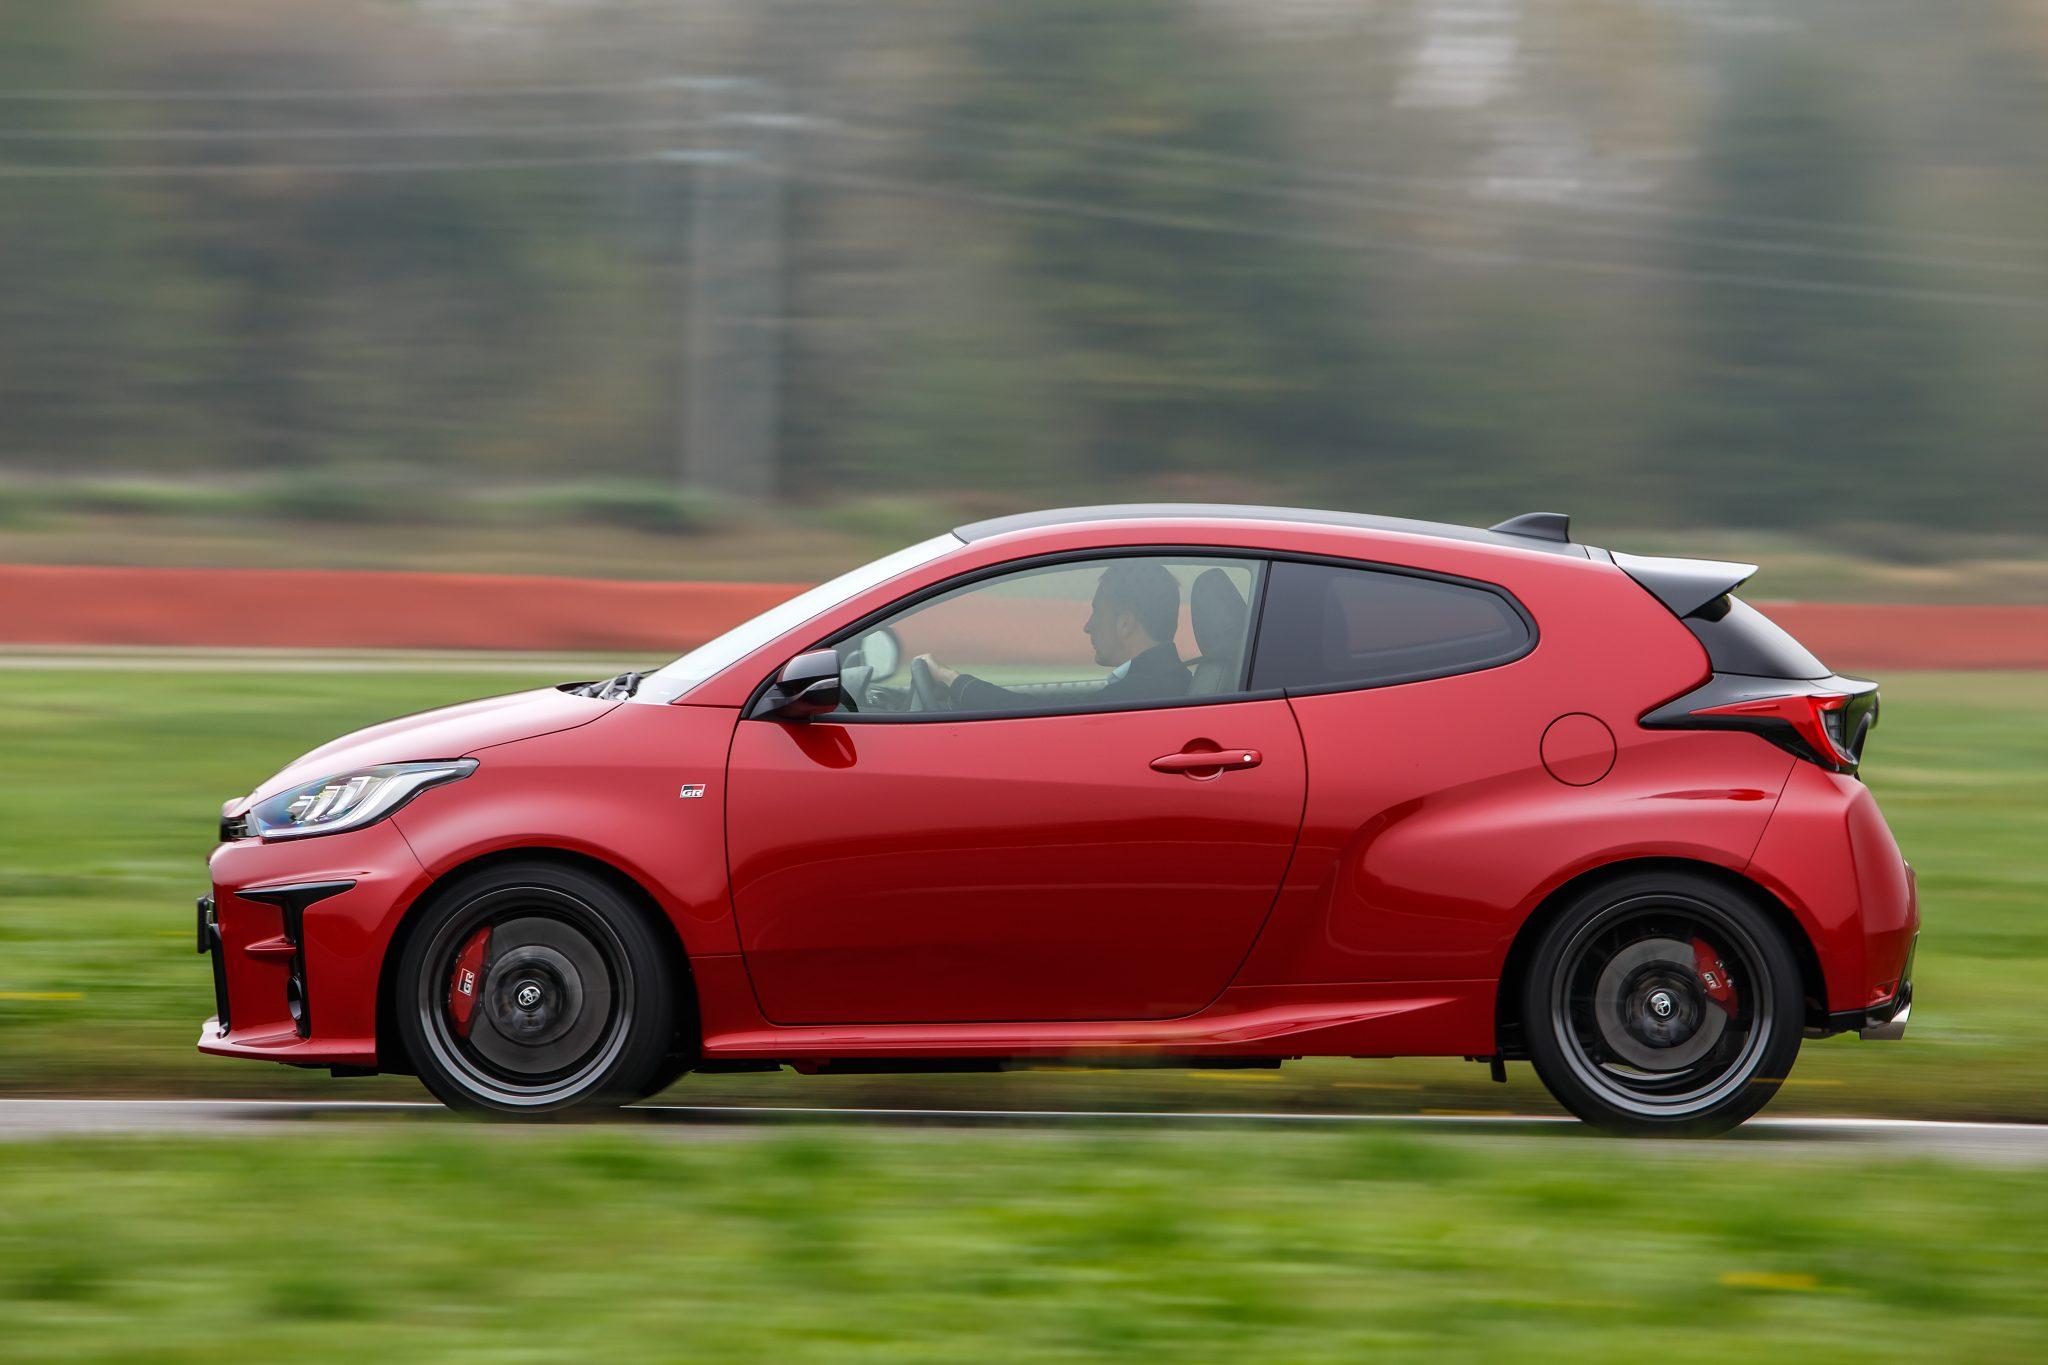 Toyota GR Yaris Performance op het circuit